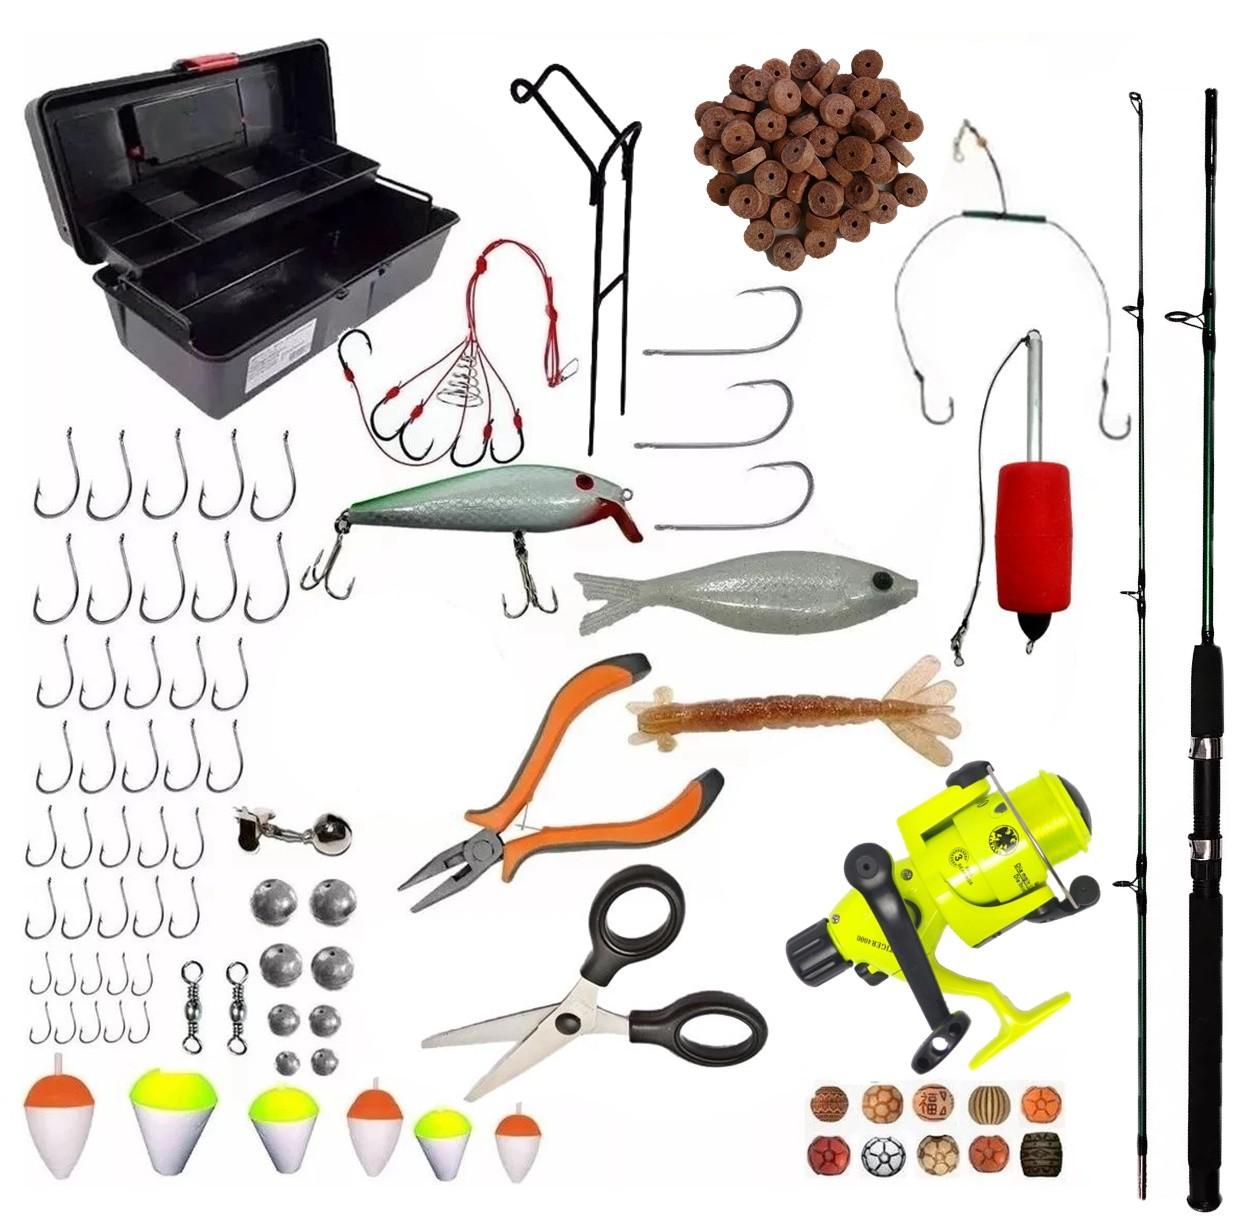 Kit Pesca Completo Vara 1,70 Molinete E Acessórios Pronto